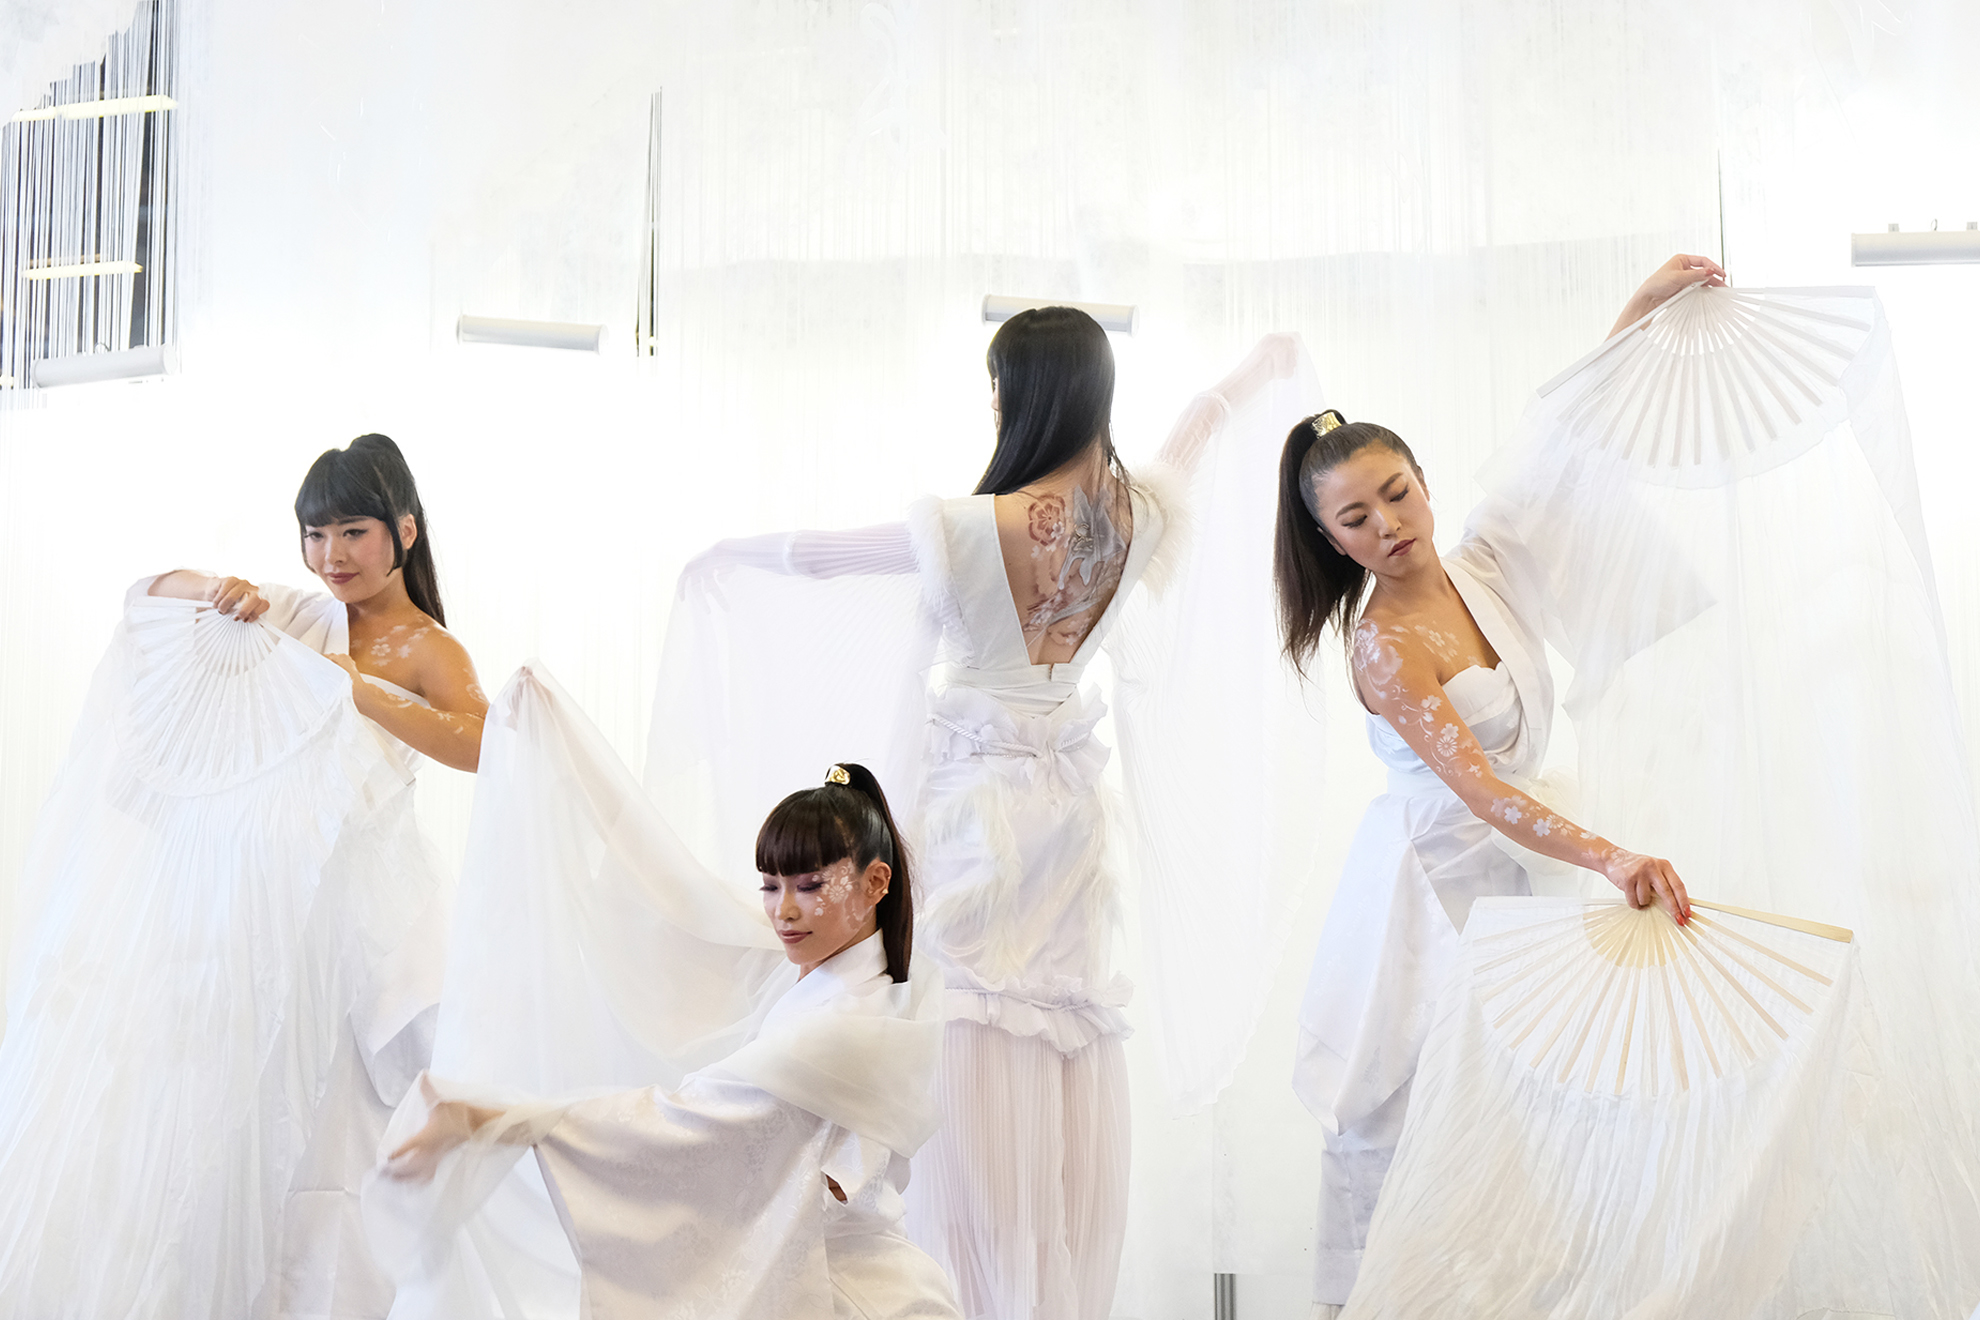 20180722【Japan Expo】『KIRIE』羽衣道中 Reports&Gallery!